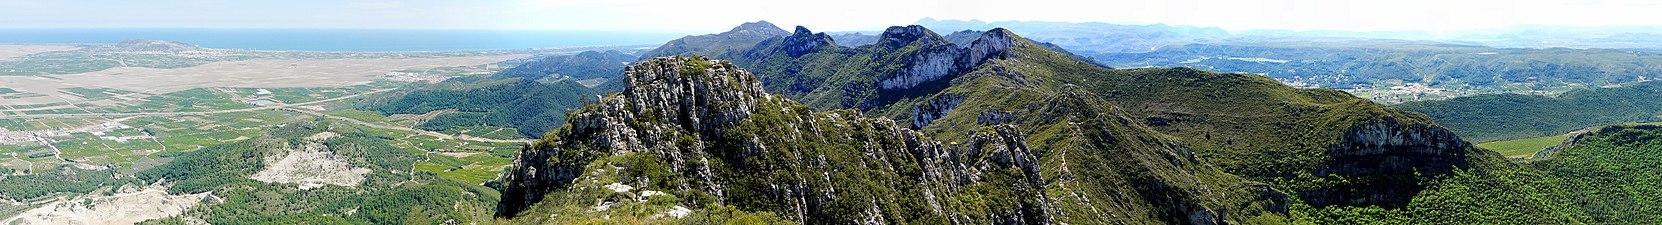 Panoramica de la sierra de Corvera.jpg